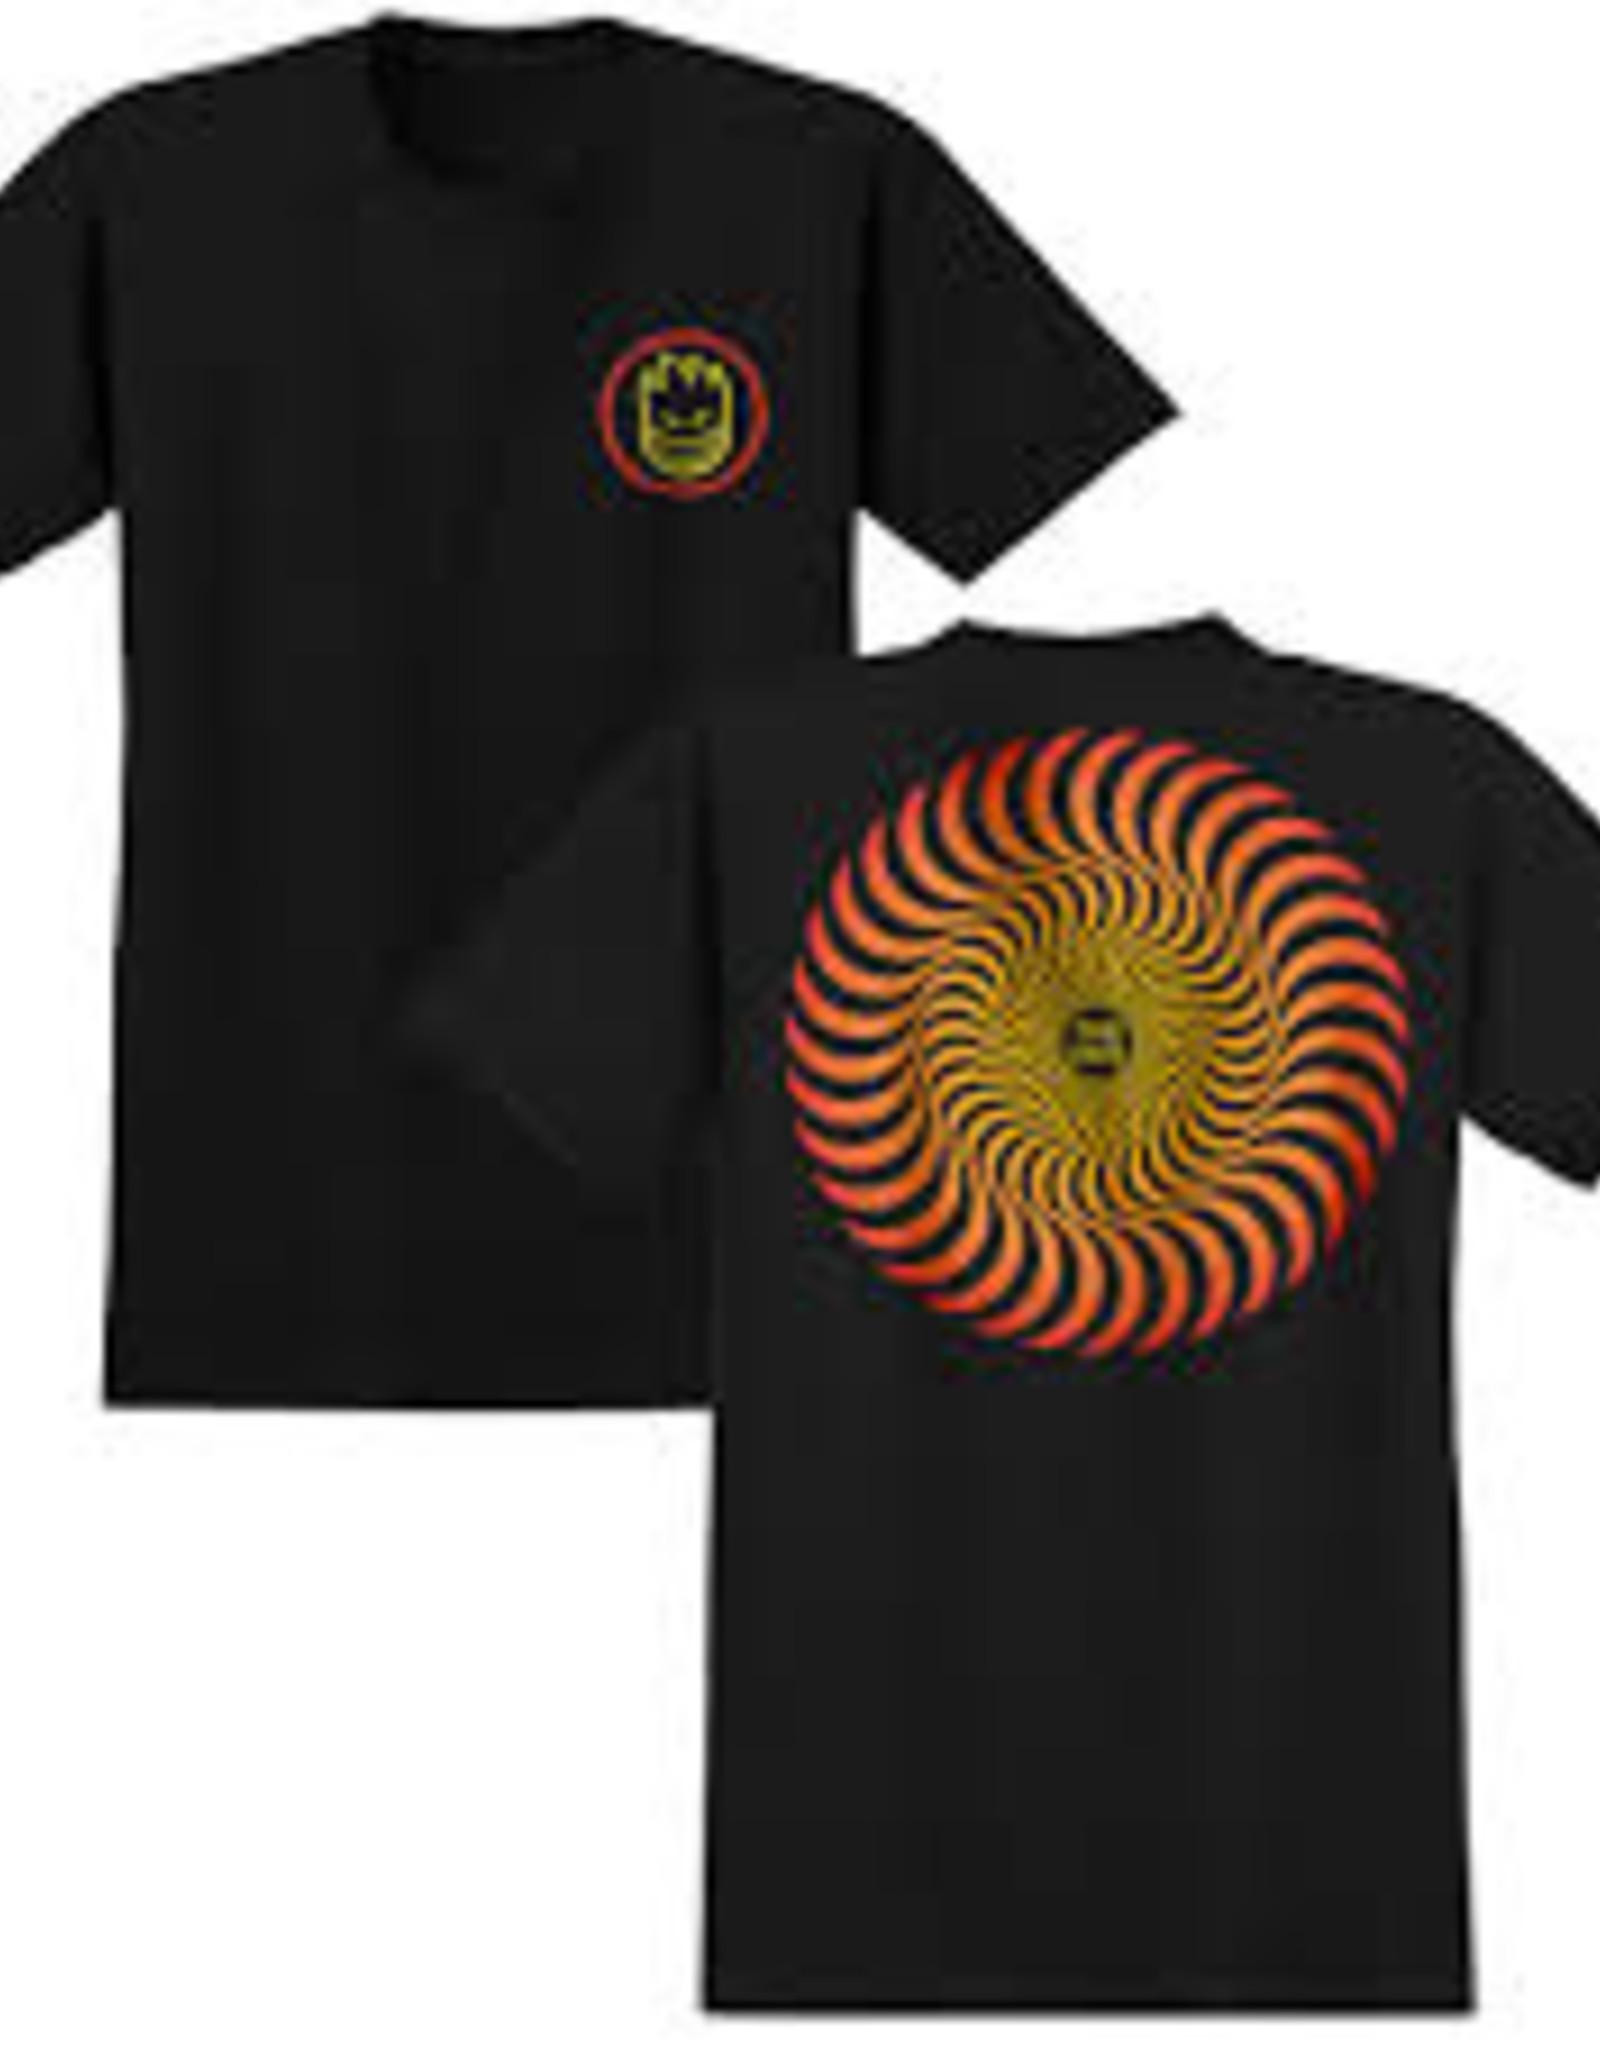 Spitfire Wheels SF Youth Tee Classic Swirl Fade